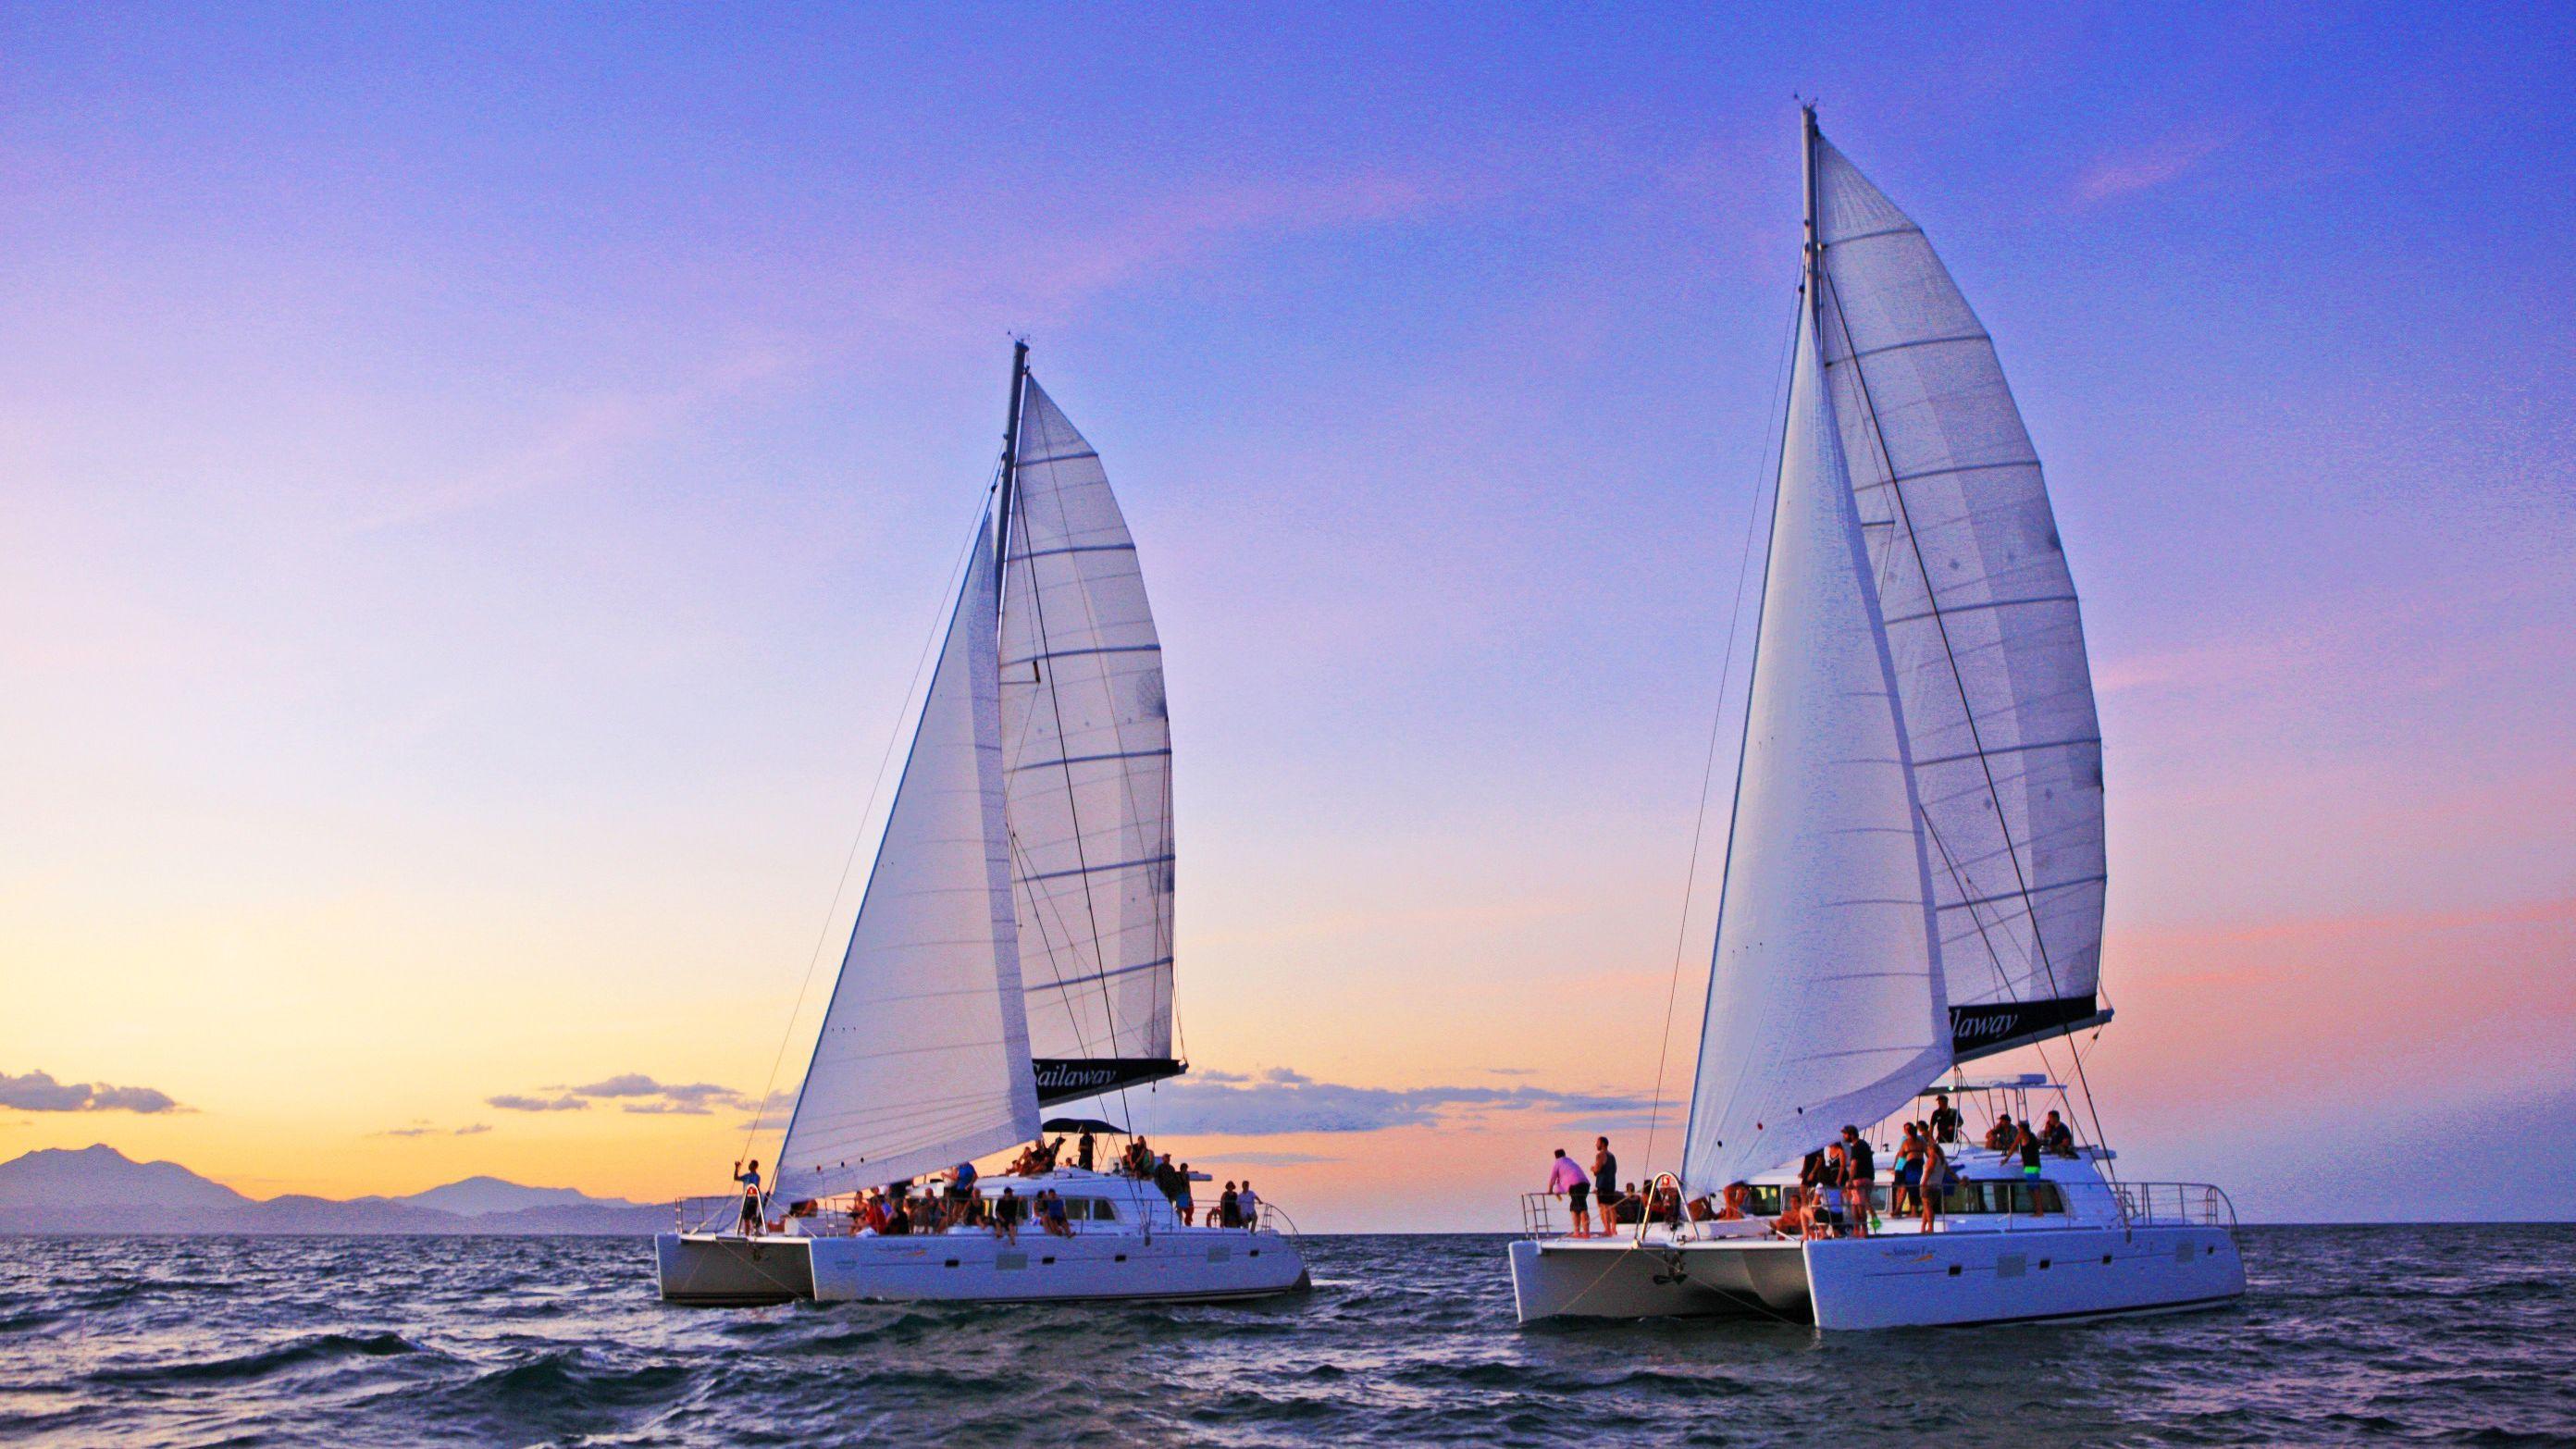 Sunset Coral Sea Cruise